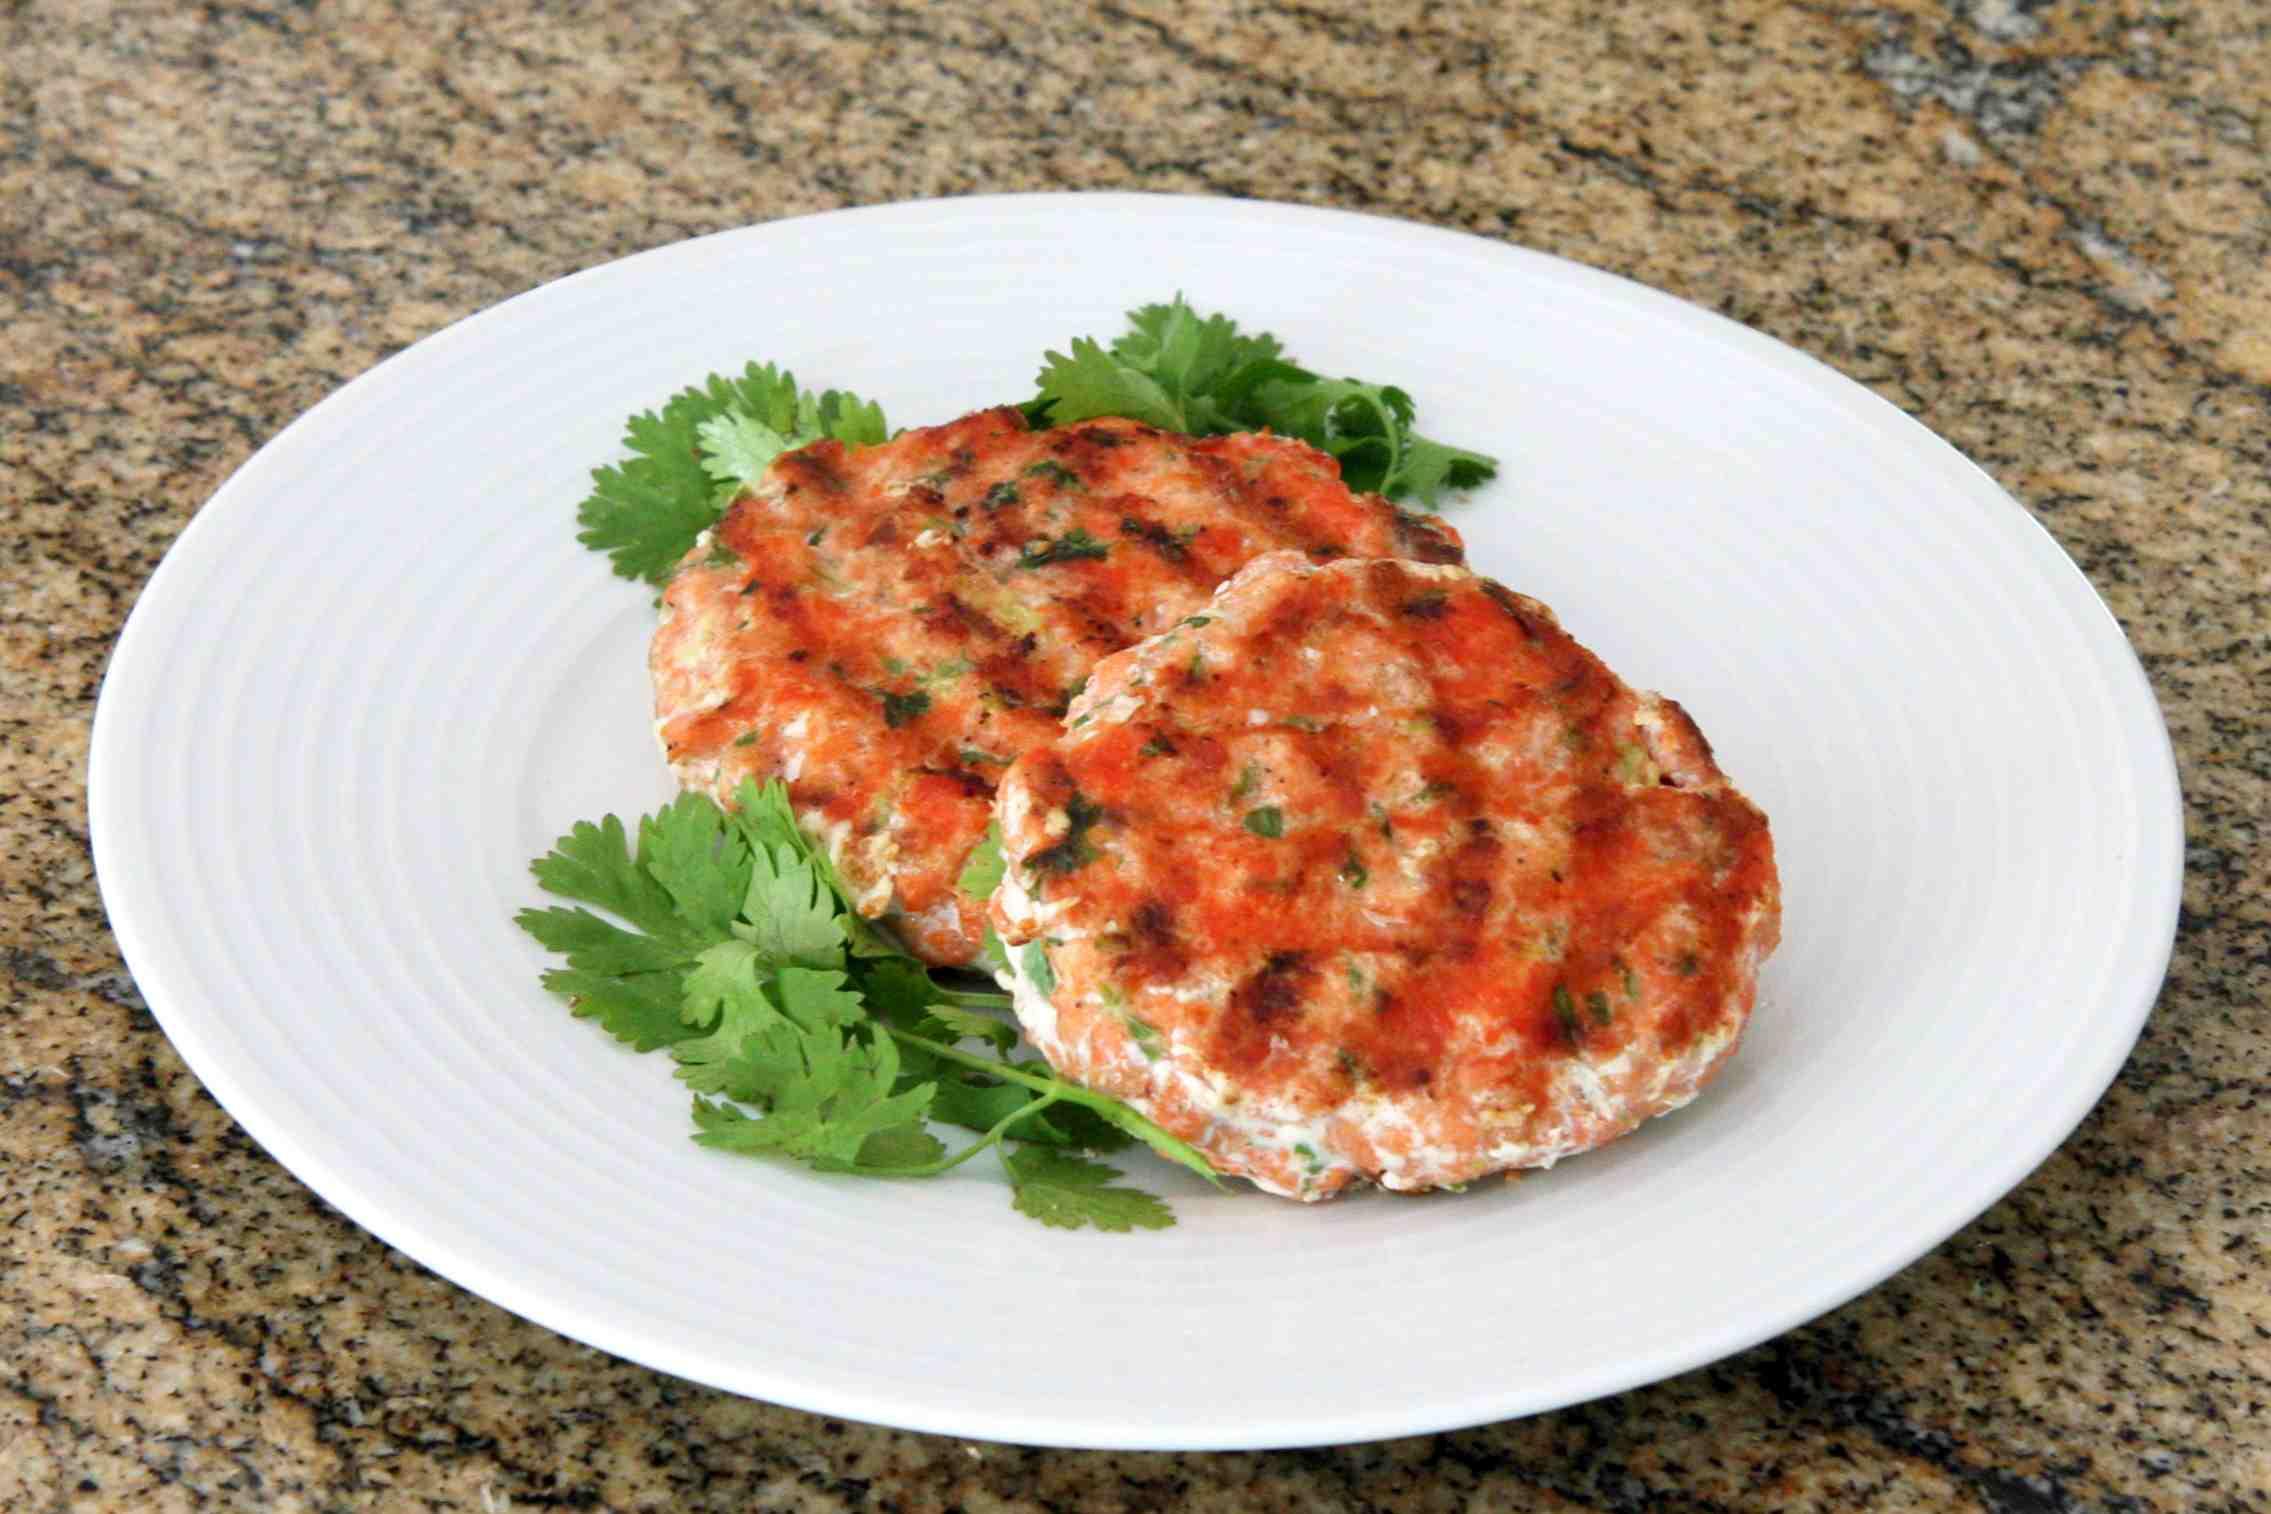 grilled salmon burgers made with sockeye salmon